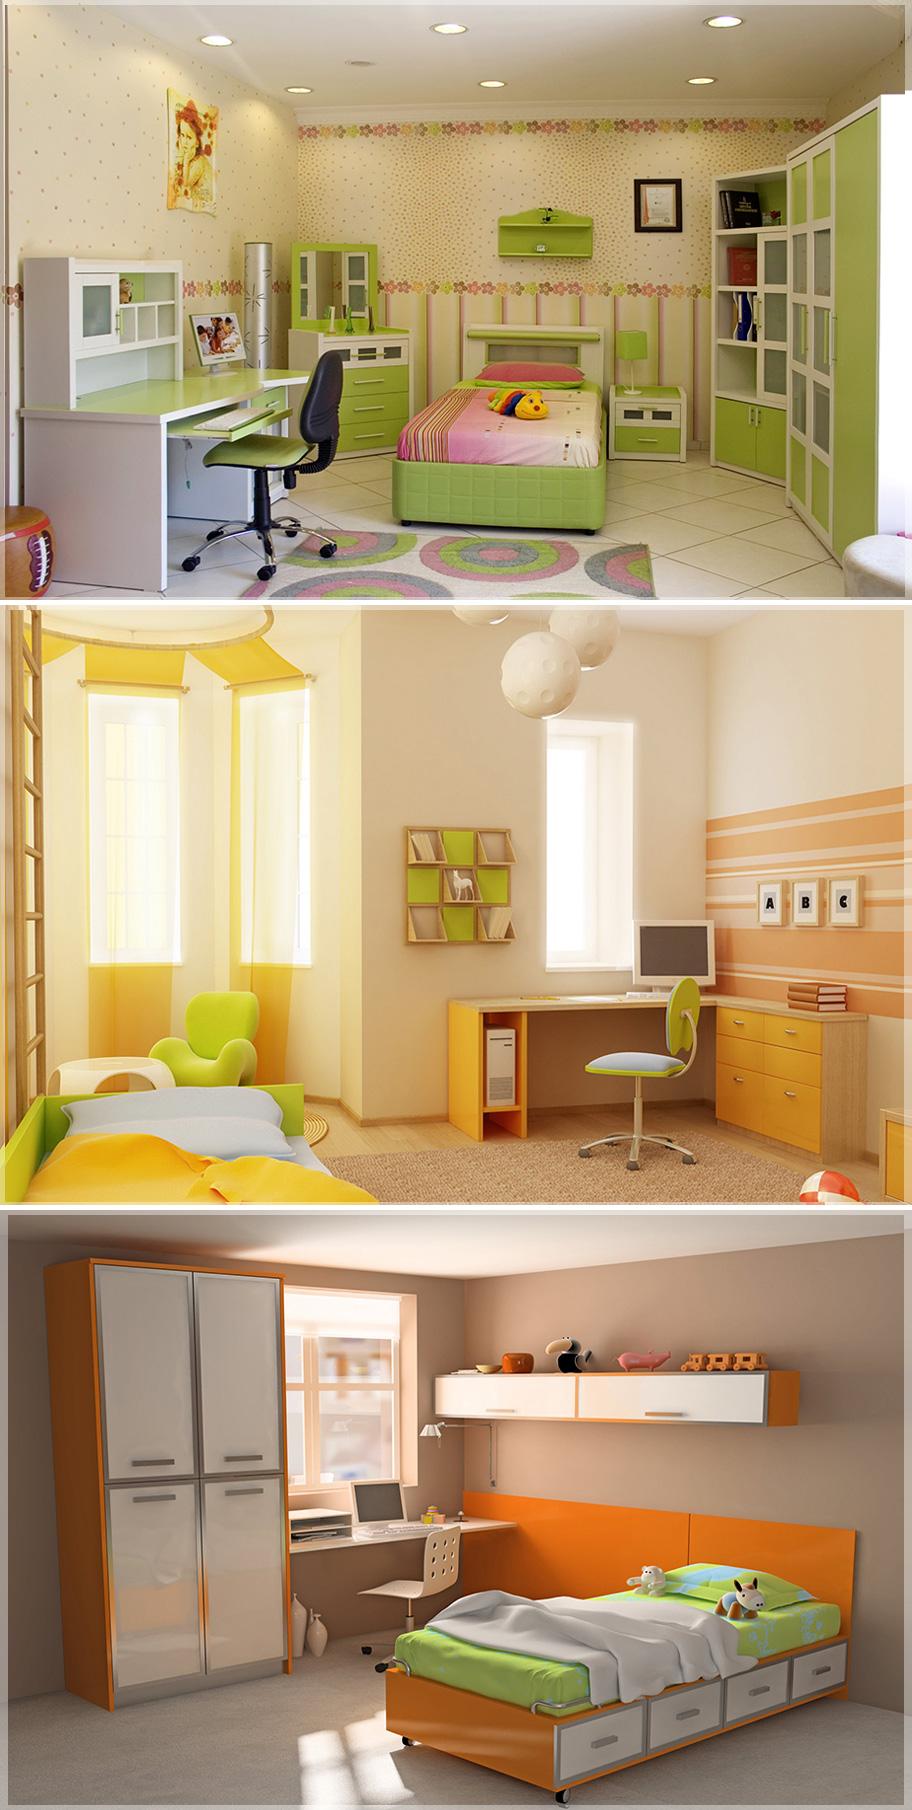 design-interior-kamar-tidur-anak